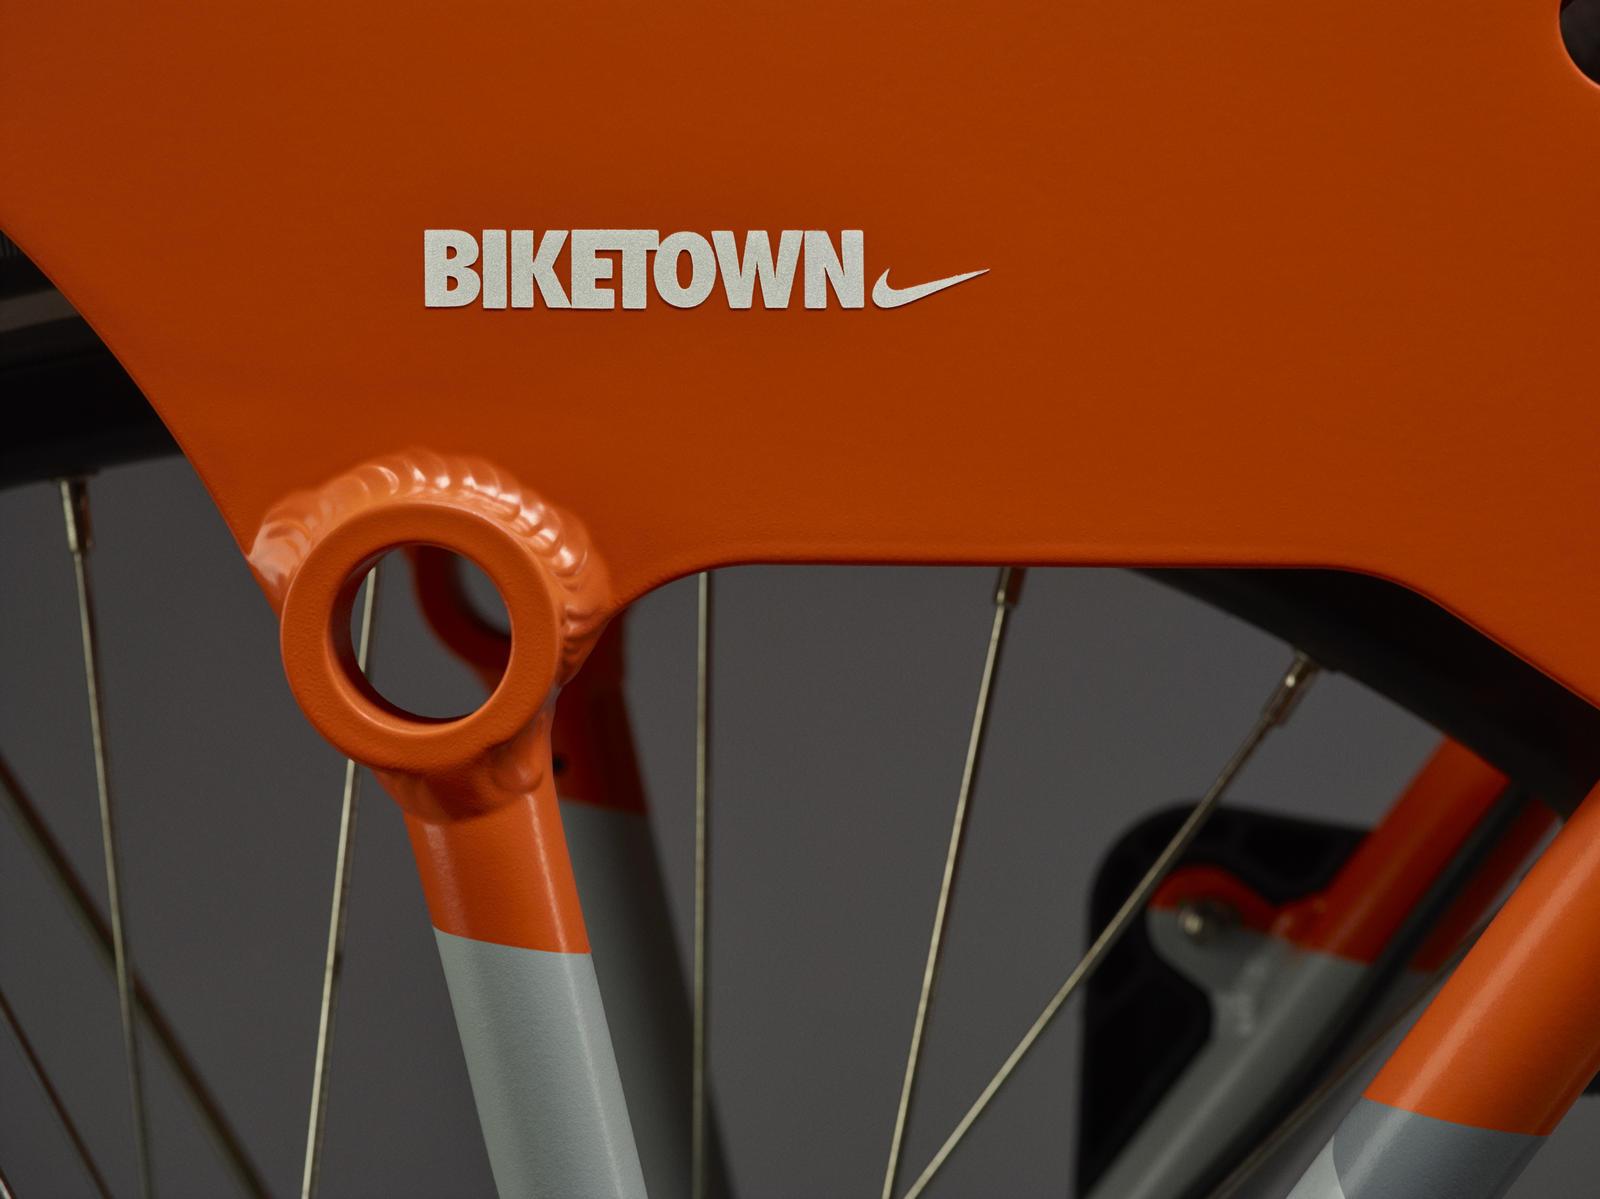 Nike_BIKETOWN_det_004_native_1600